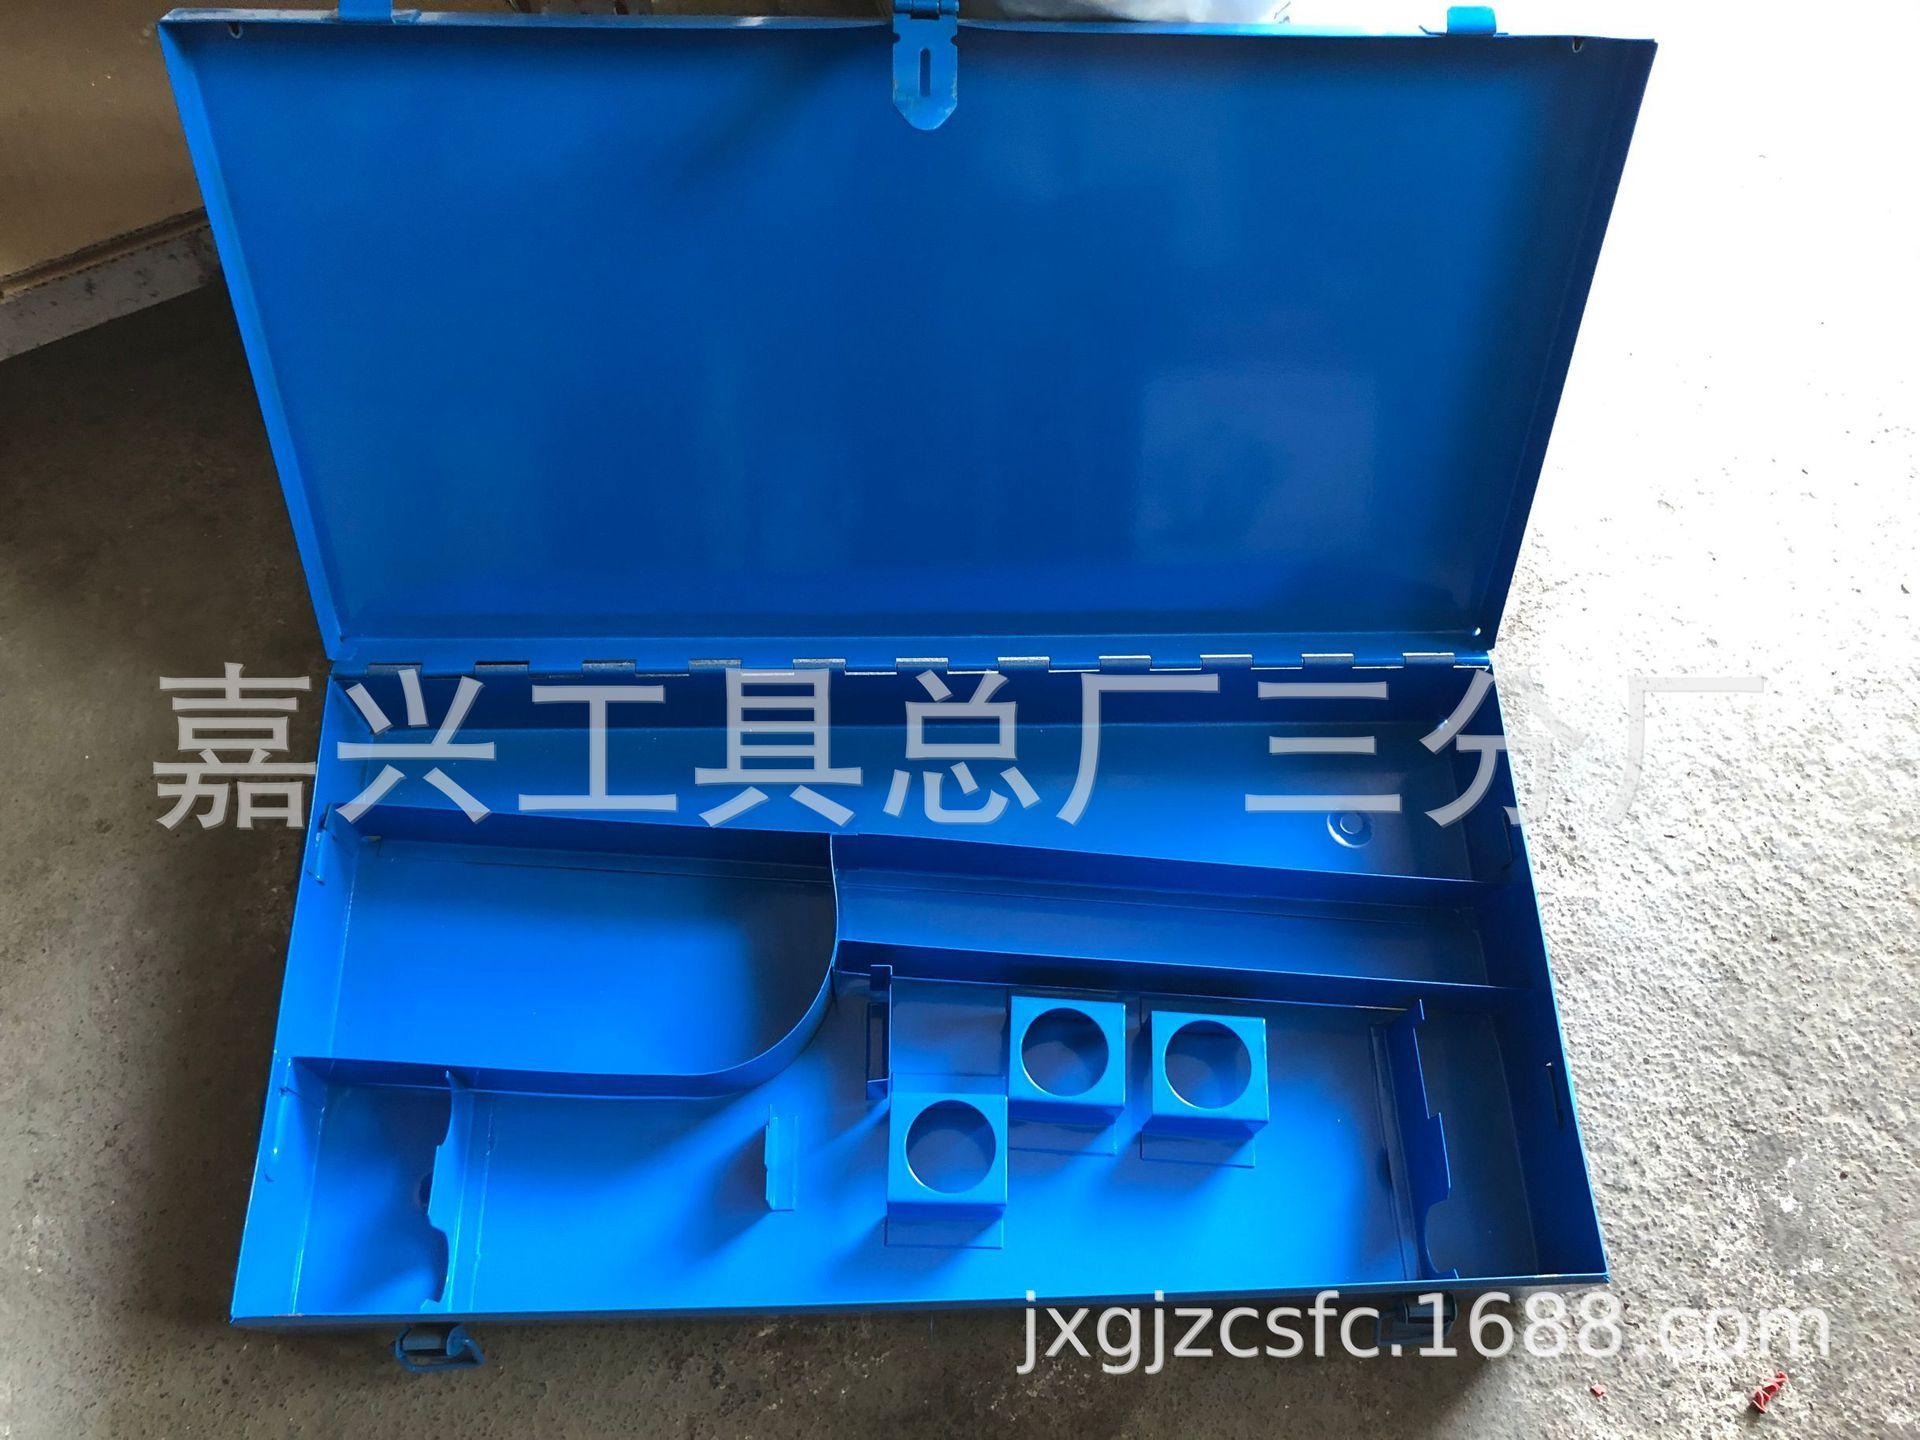 26PC套筒扳手棘轮工具组套铁盒21PC汽修工具套装铁盒